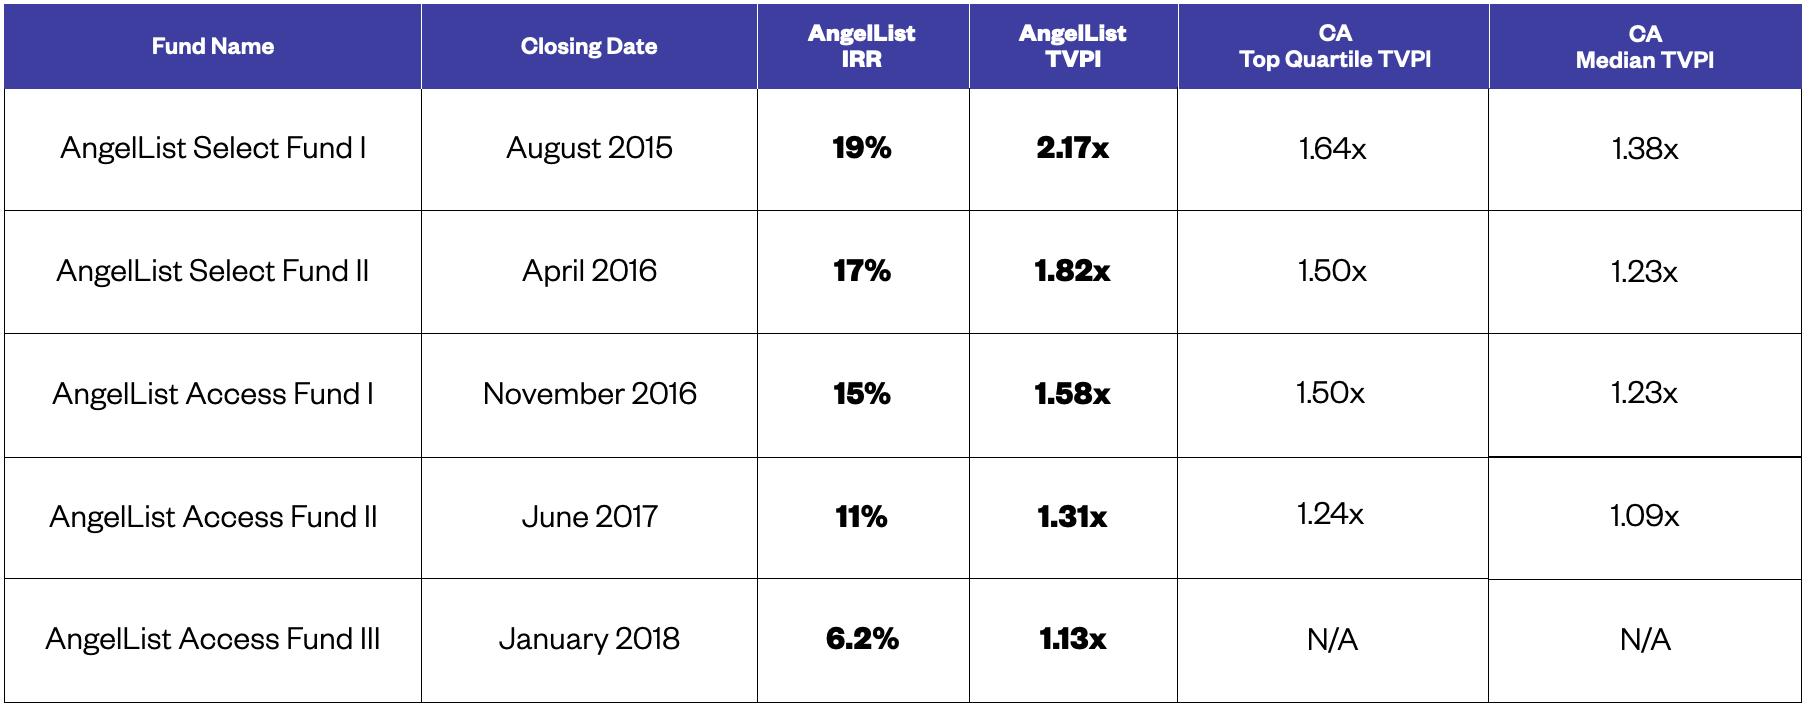 AngelList Access Fund comparison table